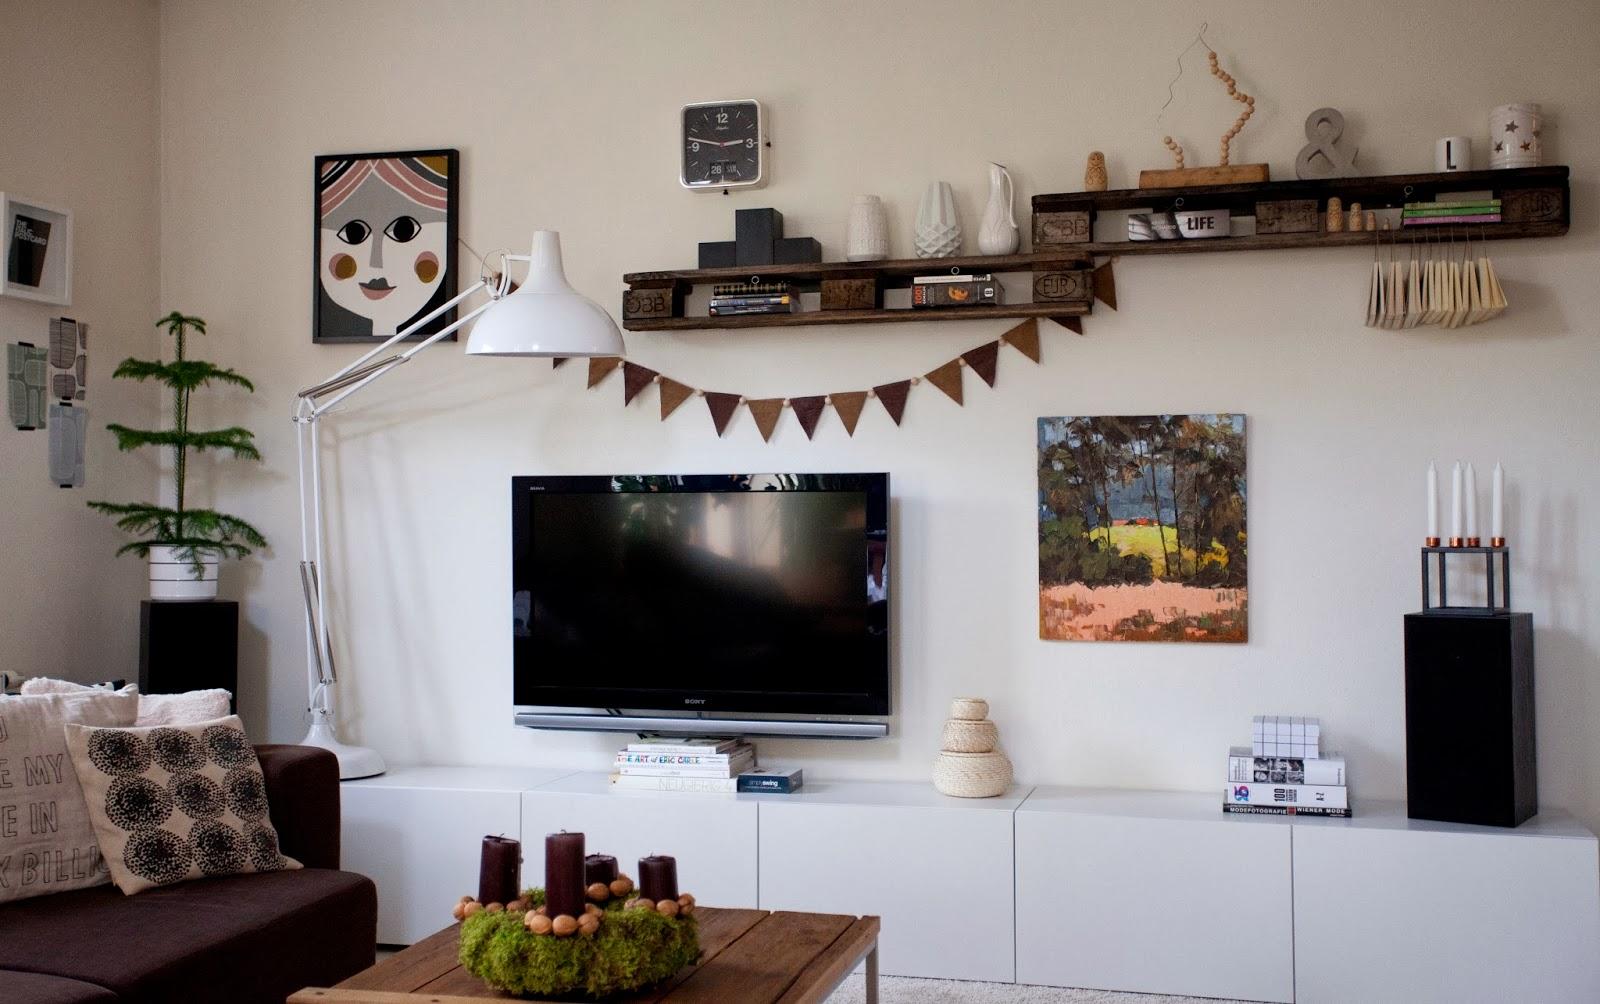 Paletten ideen wohnzimmer – dumss.com